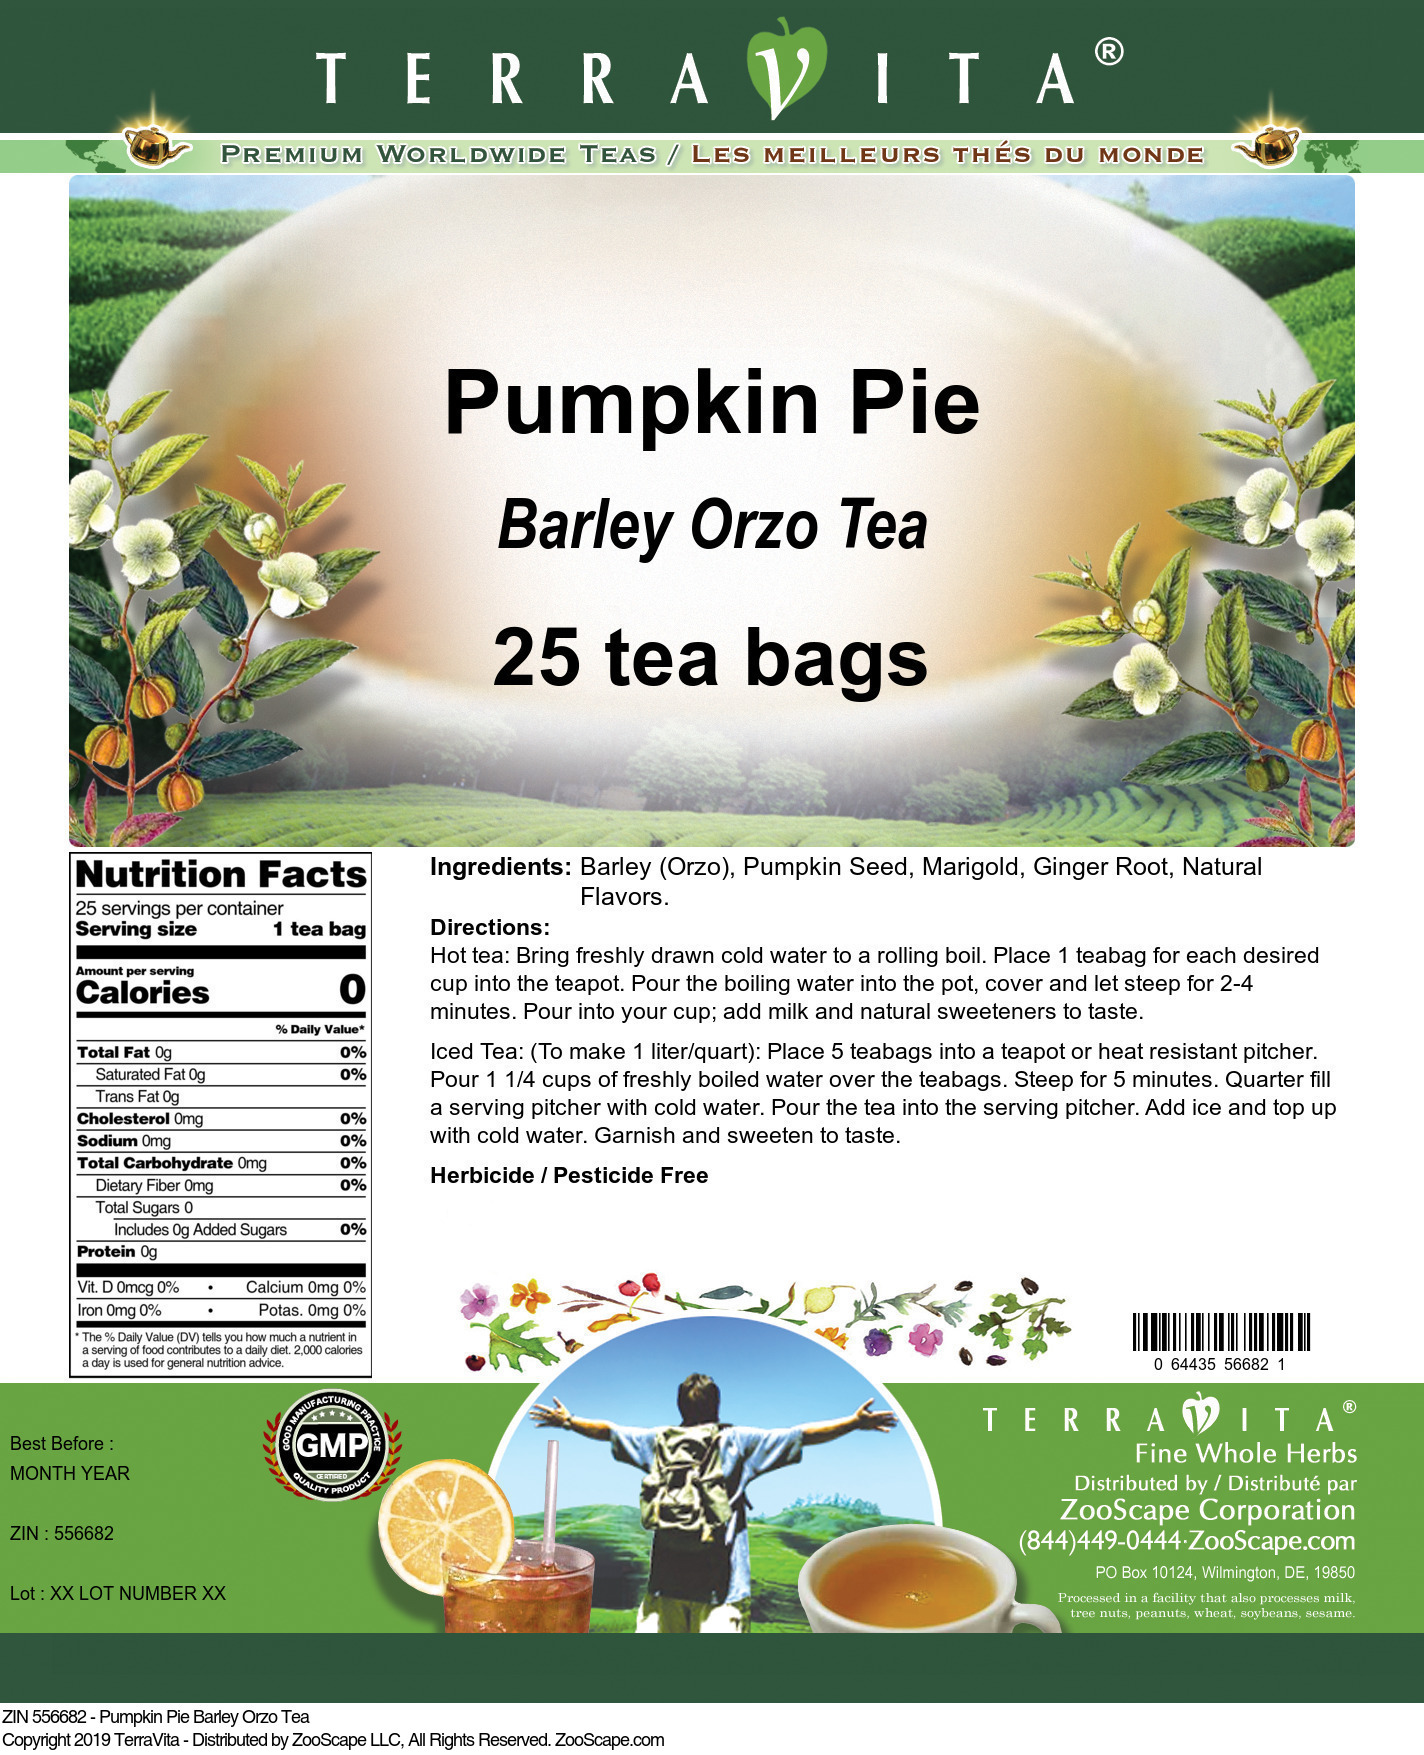 Pumpkin Pie Barley Orzo Tea